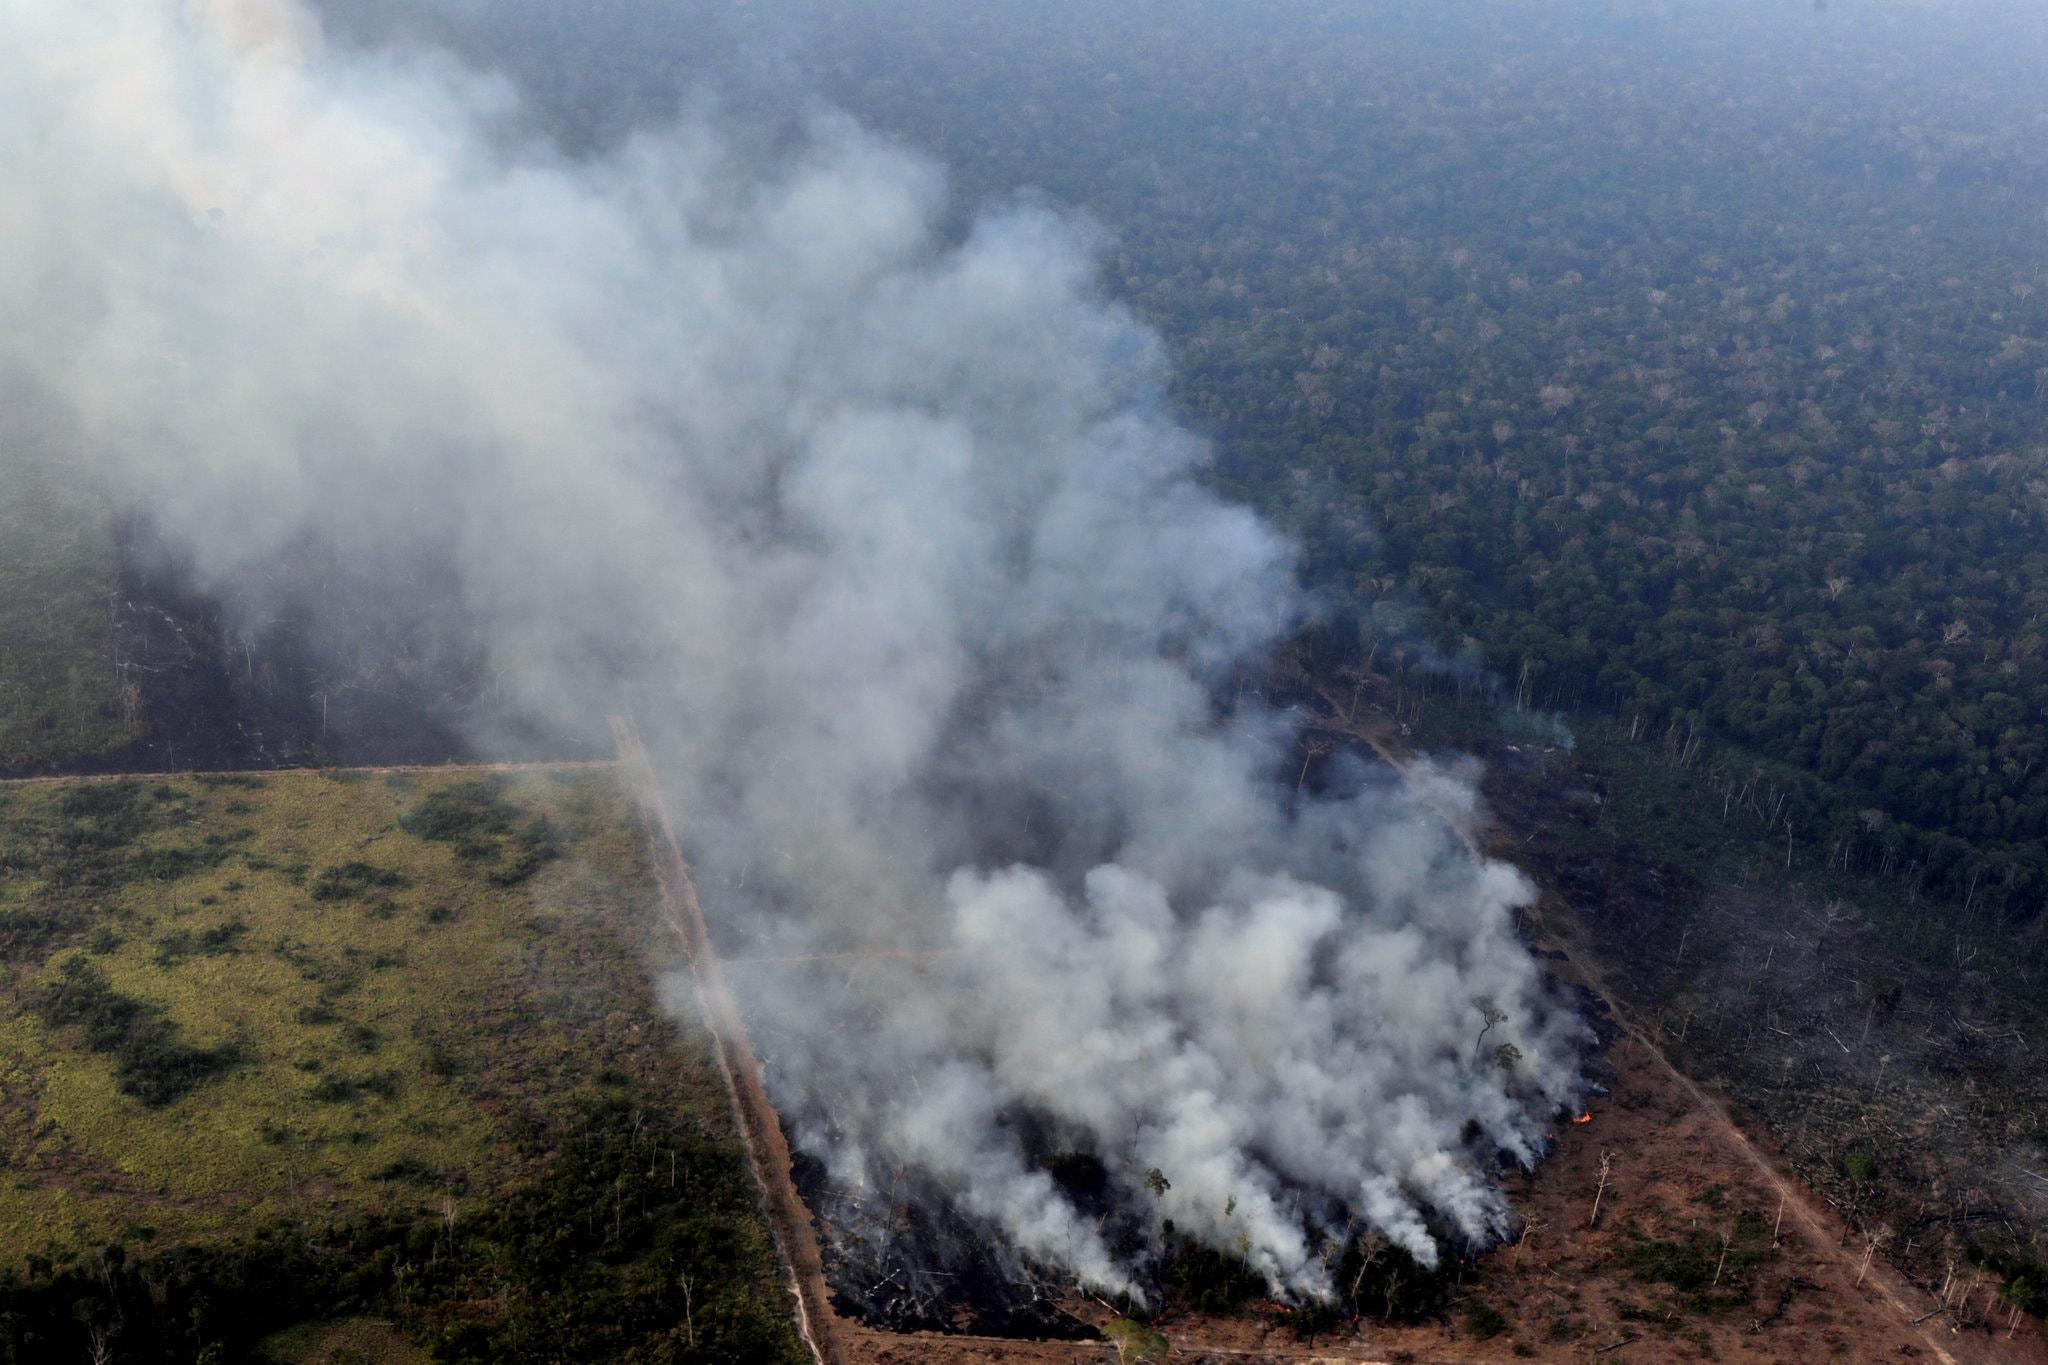 A fire in the Amazon rain forest near Porto Velho, Rondonia State, Brazil.